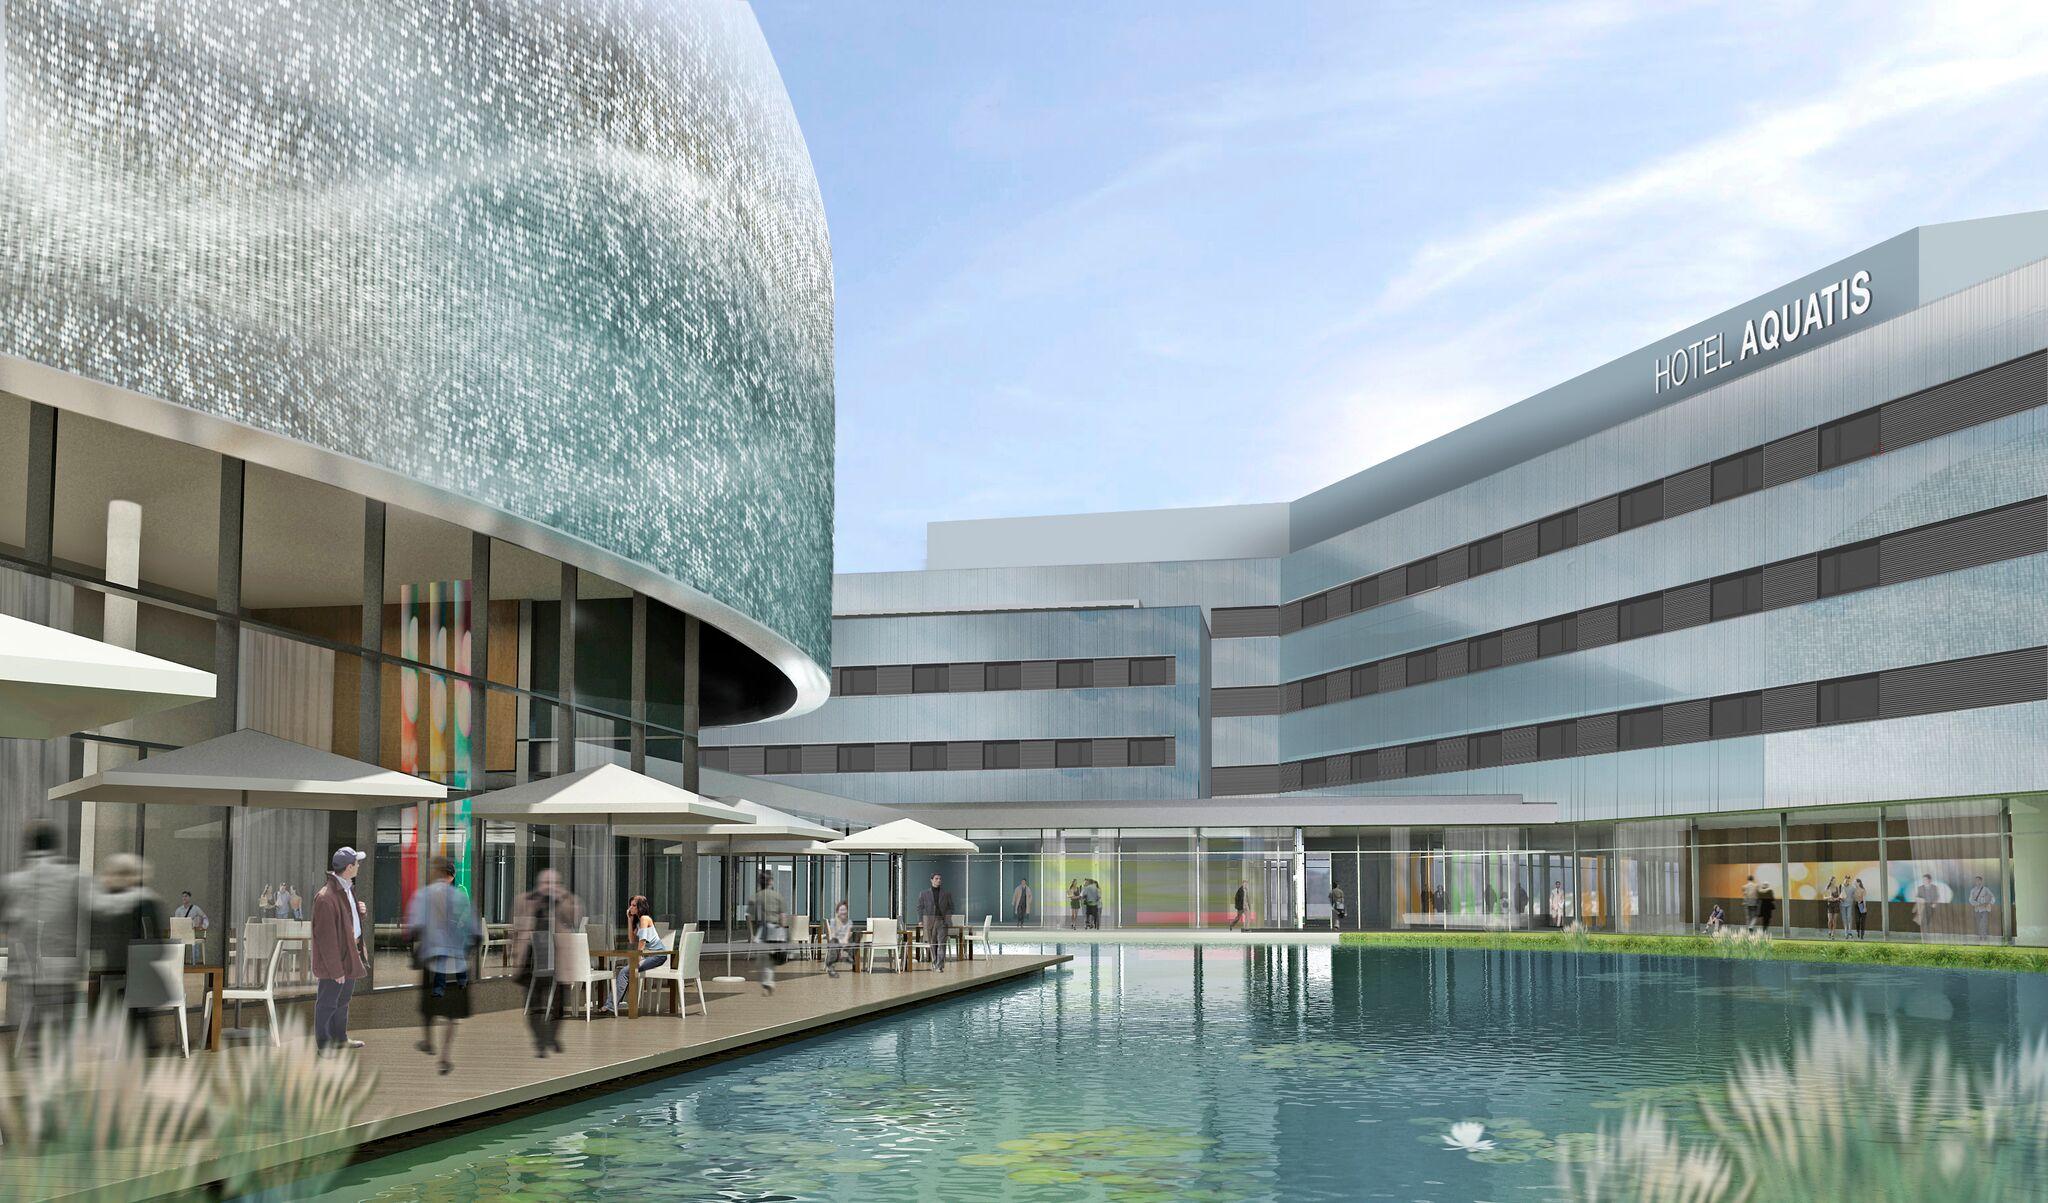 AQUATIS_Hotel & Centro Congressi e l'Aquarium Vivarium_©Richter Dahl Rocha & Associés